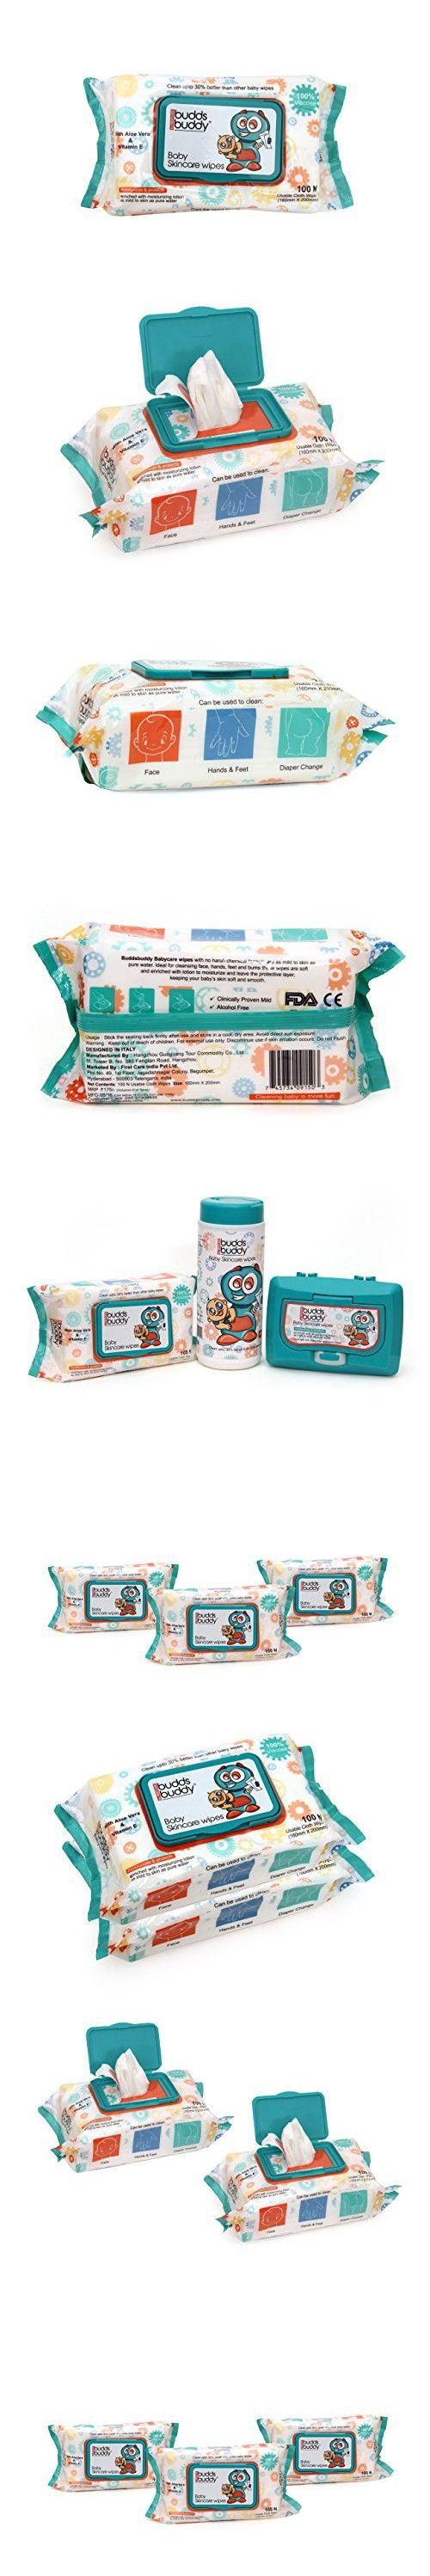 Buddsbuddy Baby Skin Care Wipes,100Pcs Combo Of 10Packs(1000 Count),Ninku (White)